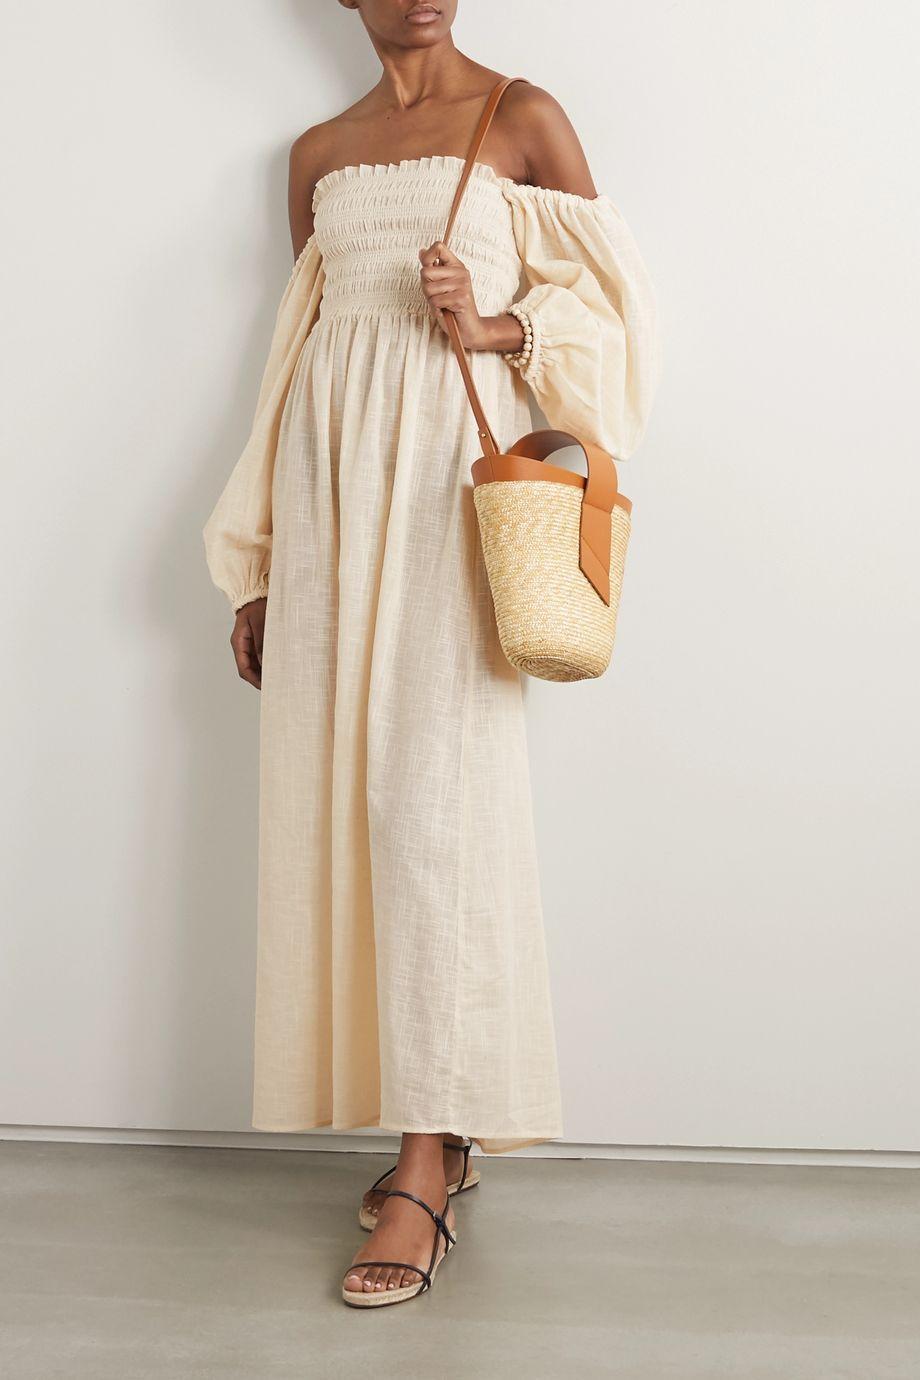 Cream Net Sustain Agatha Shirred Organic Cotton Gauze Midi Dress Cloe Cassandro Net A Porter Fashion Dresses To Wear To A Wedding Organic Cotton [ 1380 x 920 Pixel ]